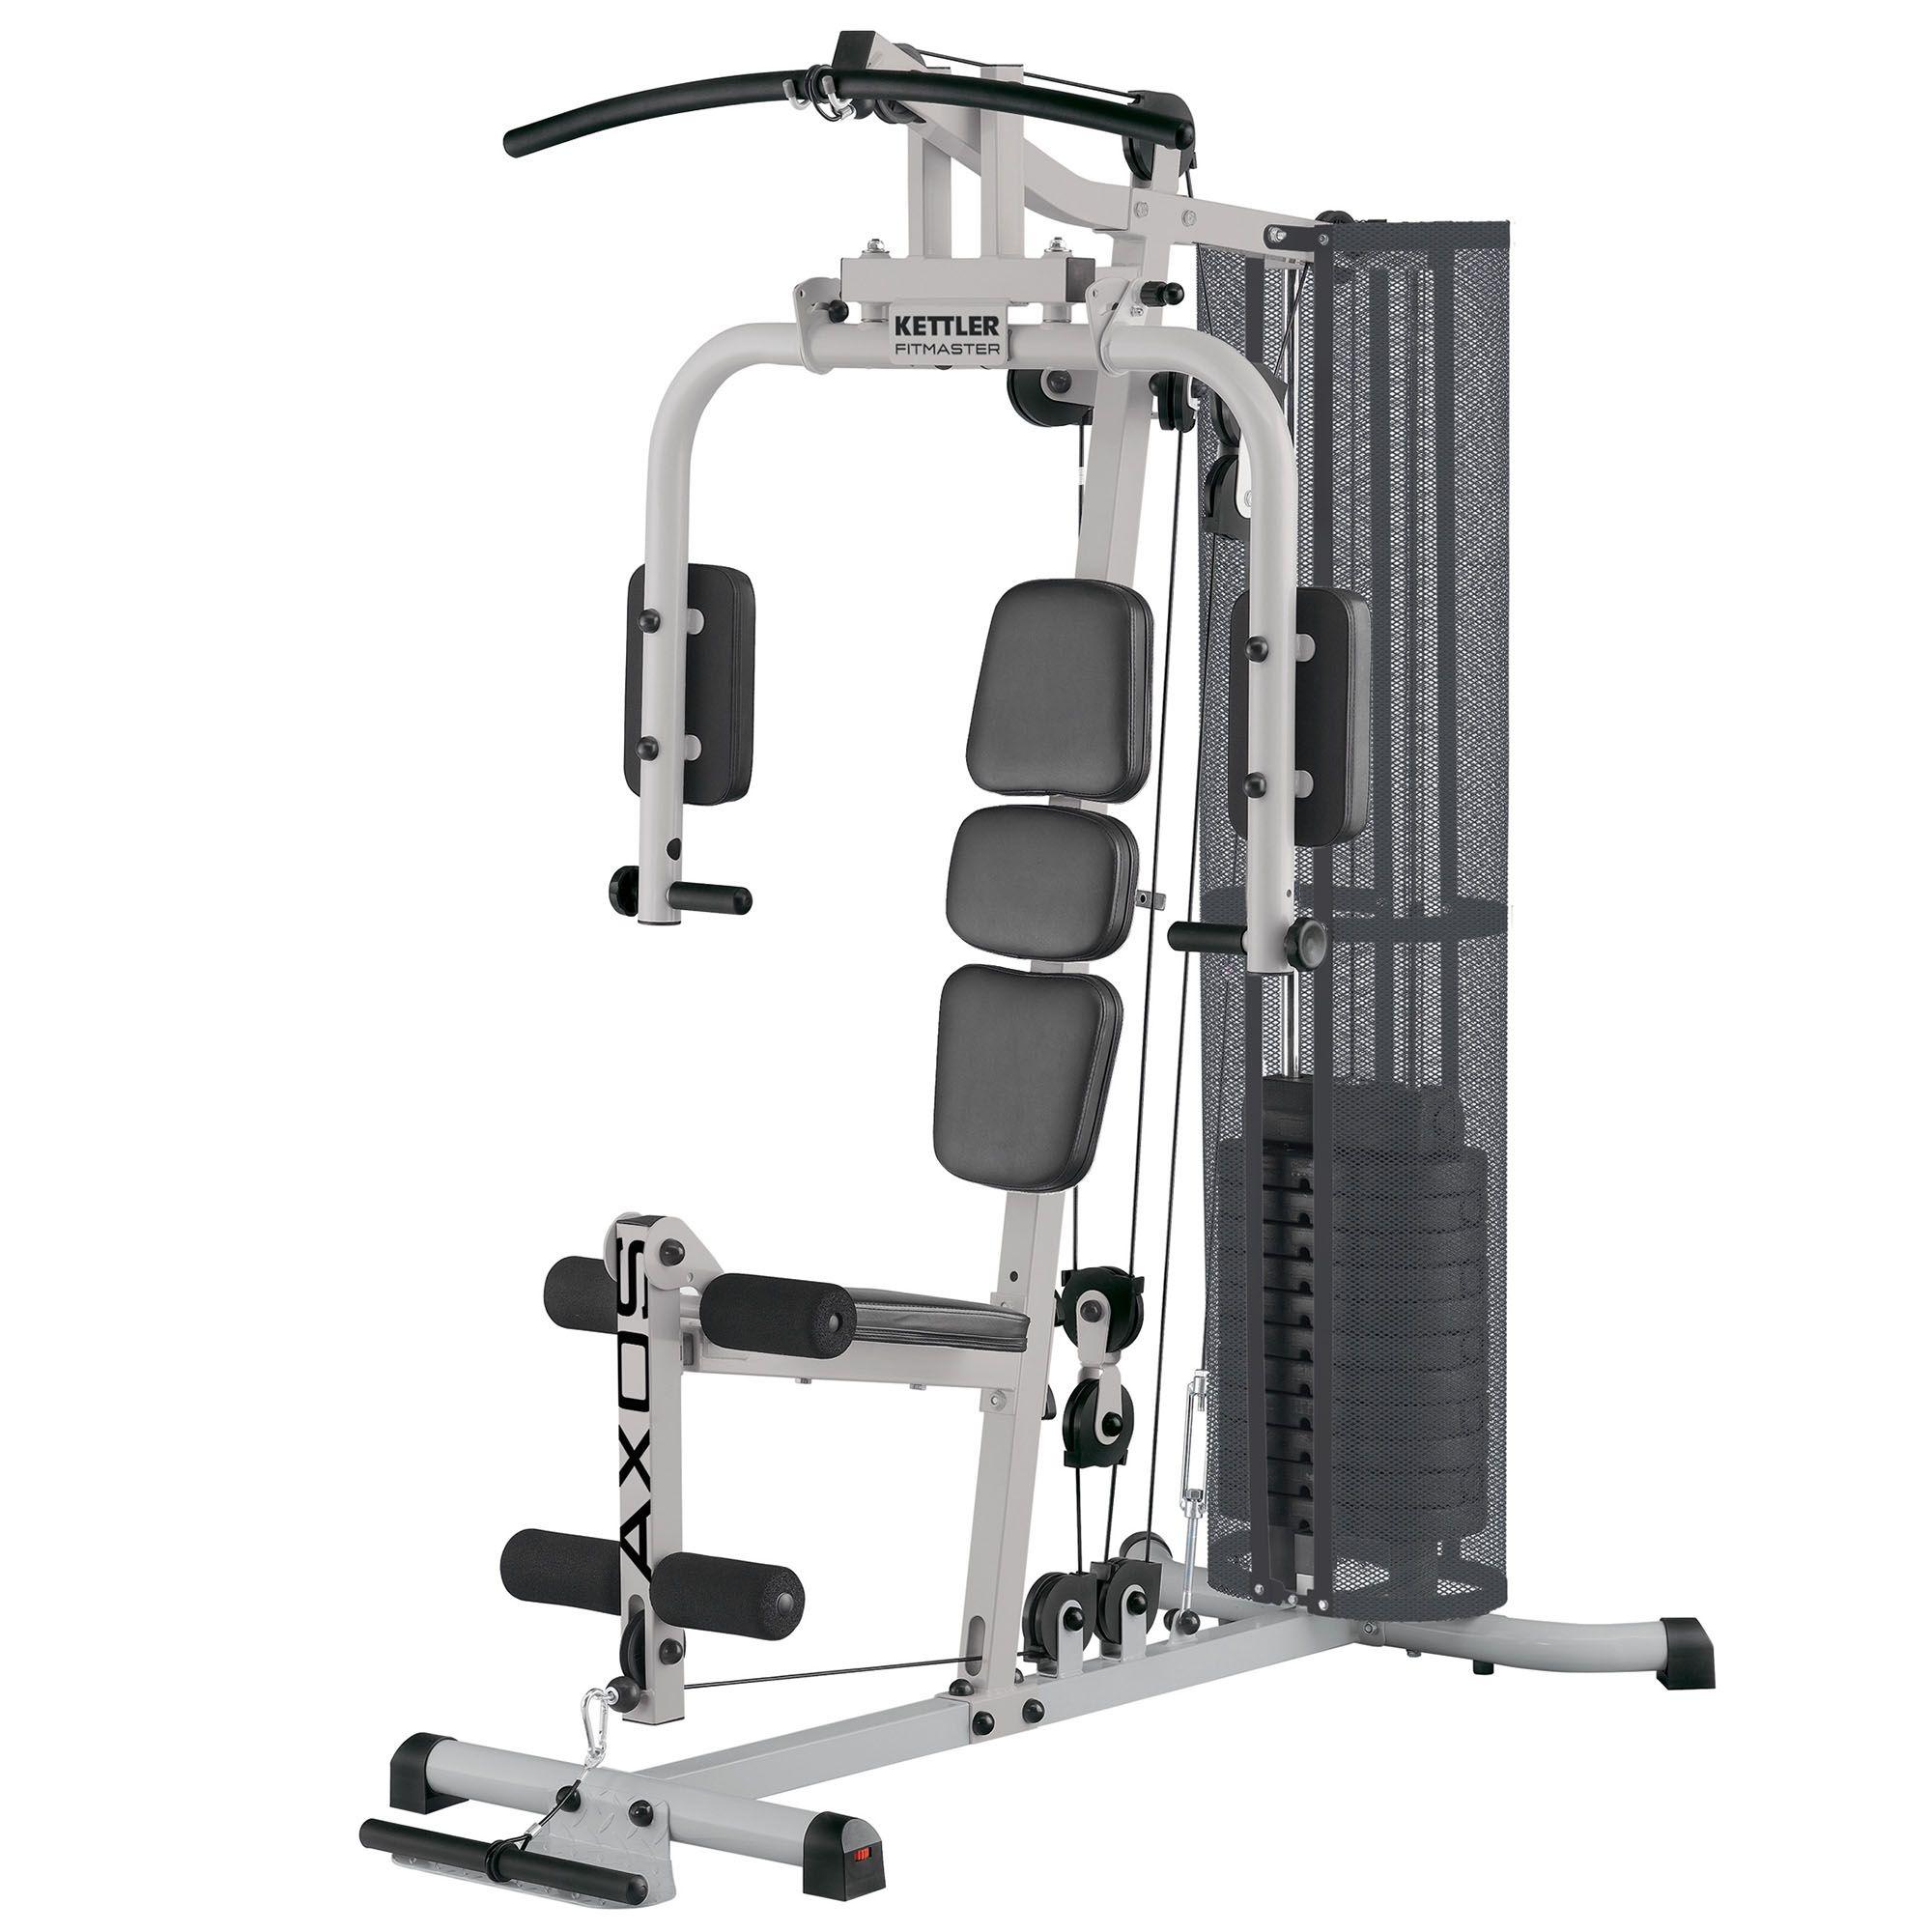 Kettler Axos Fitmaster Multi Gym Sweatband Com